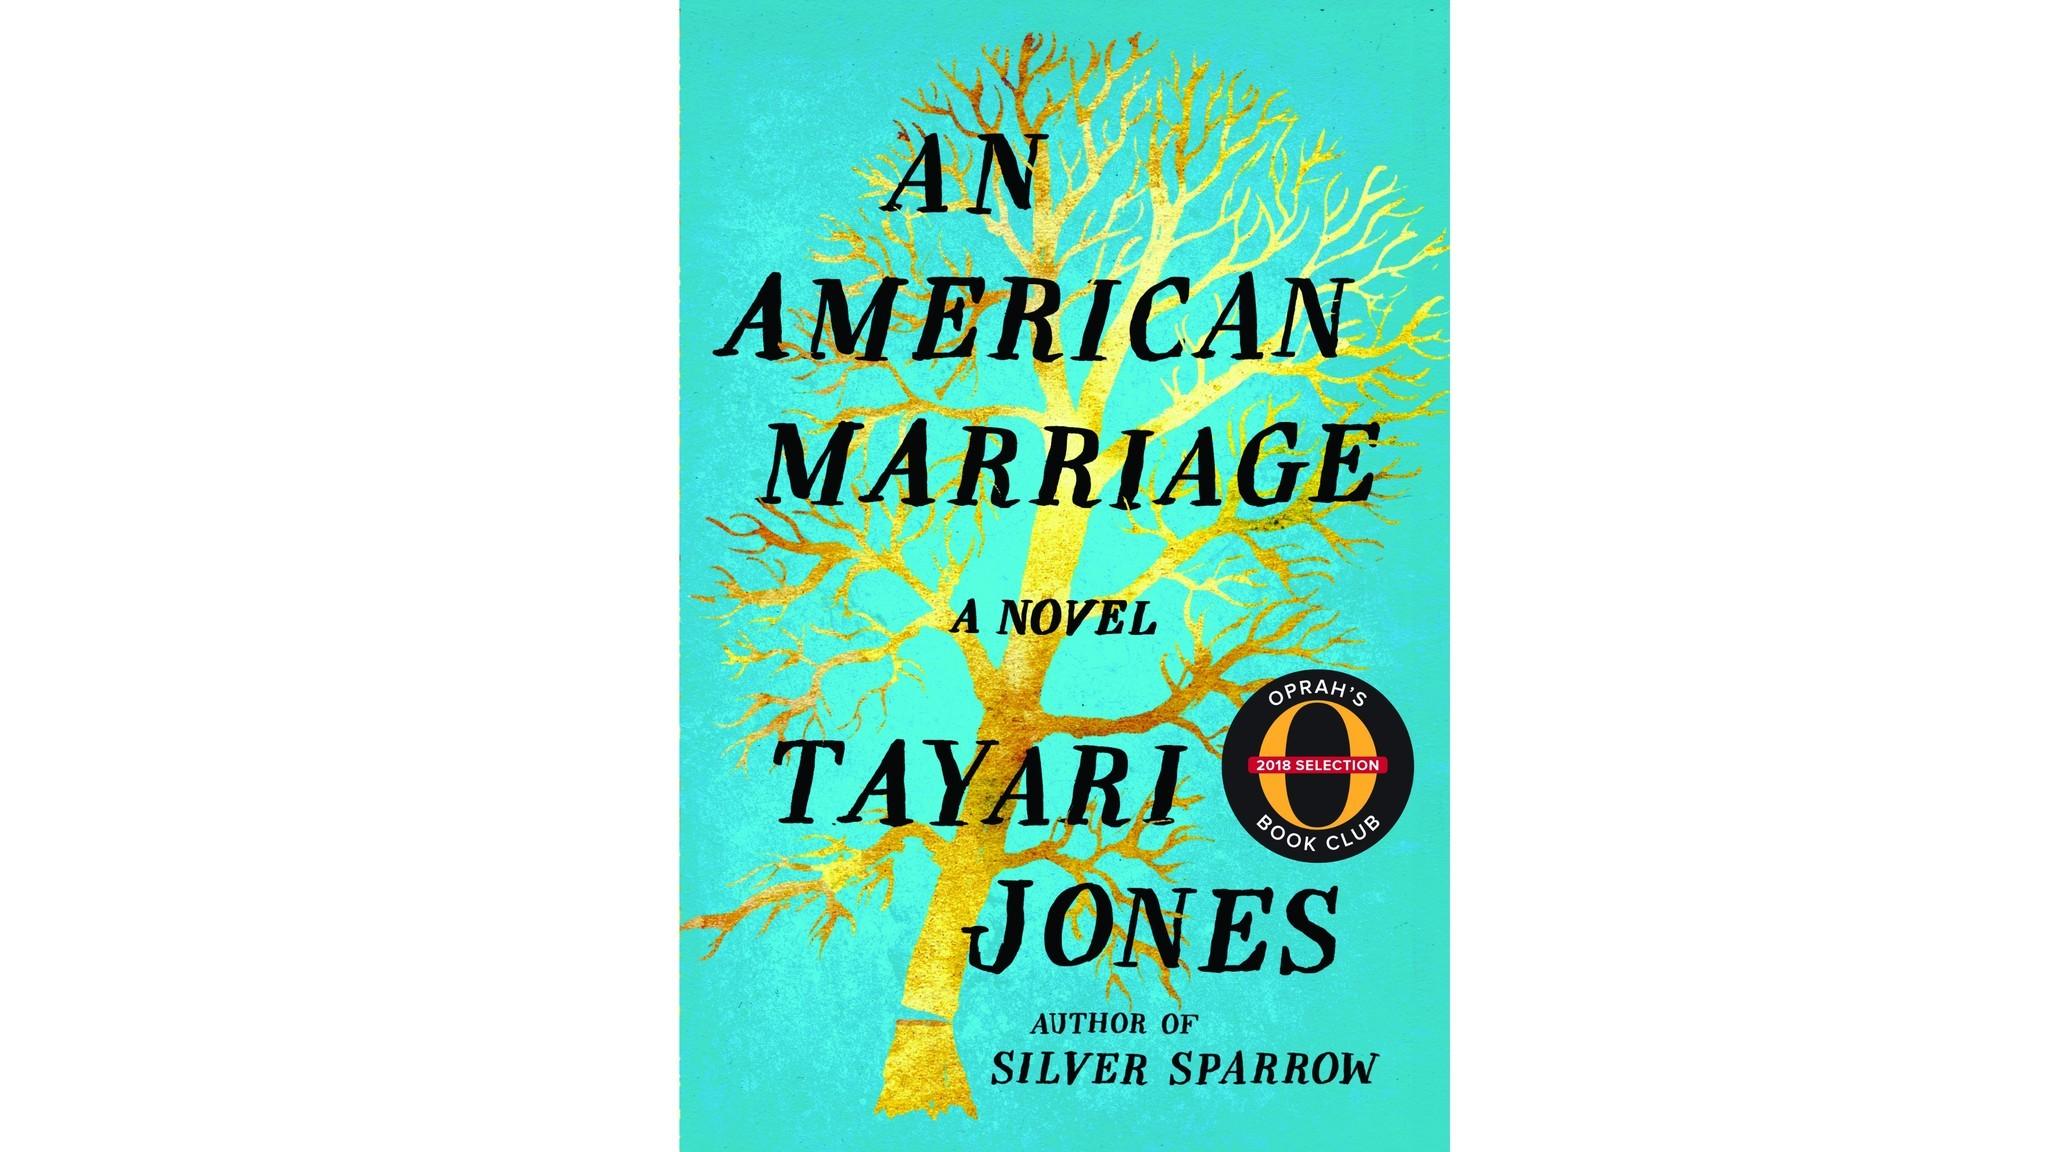 Tayari Jones' 'An American Marriage'.